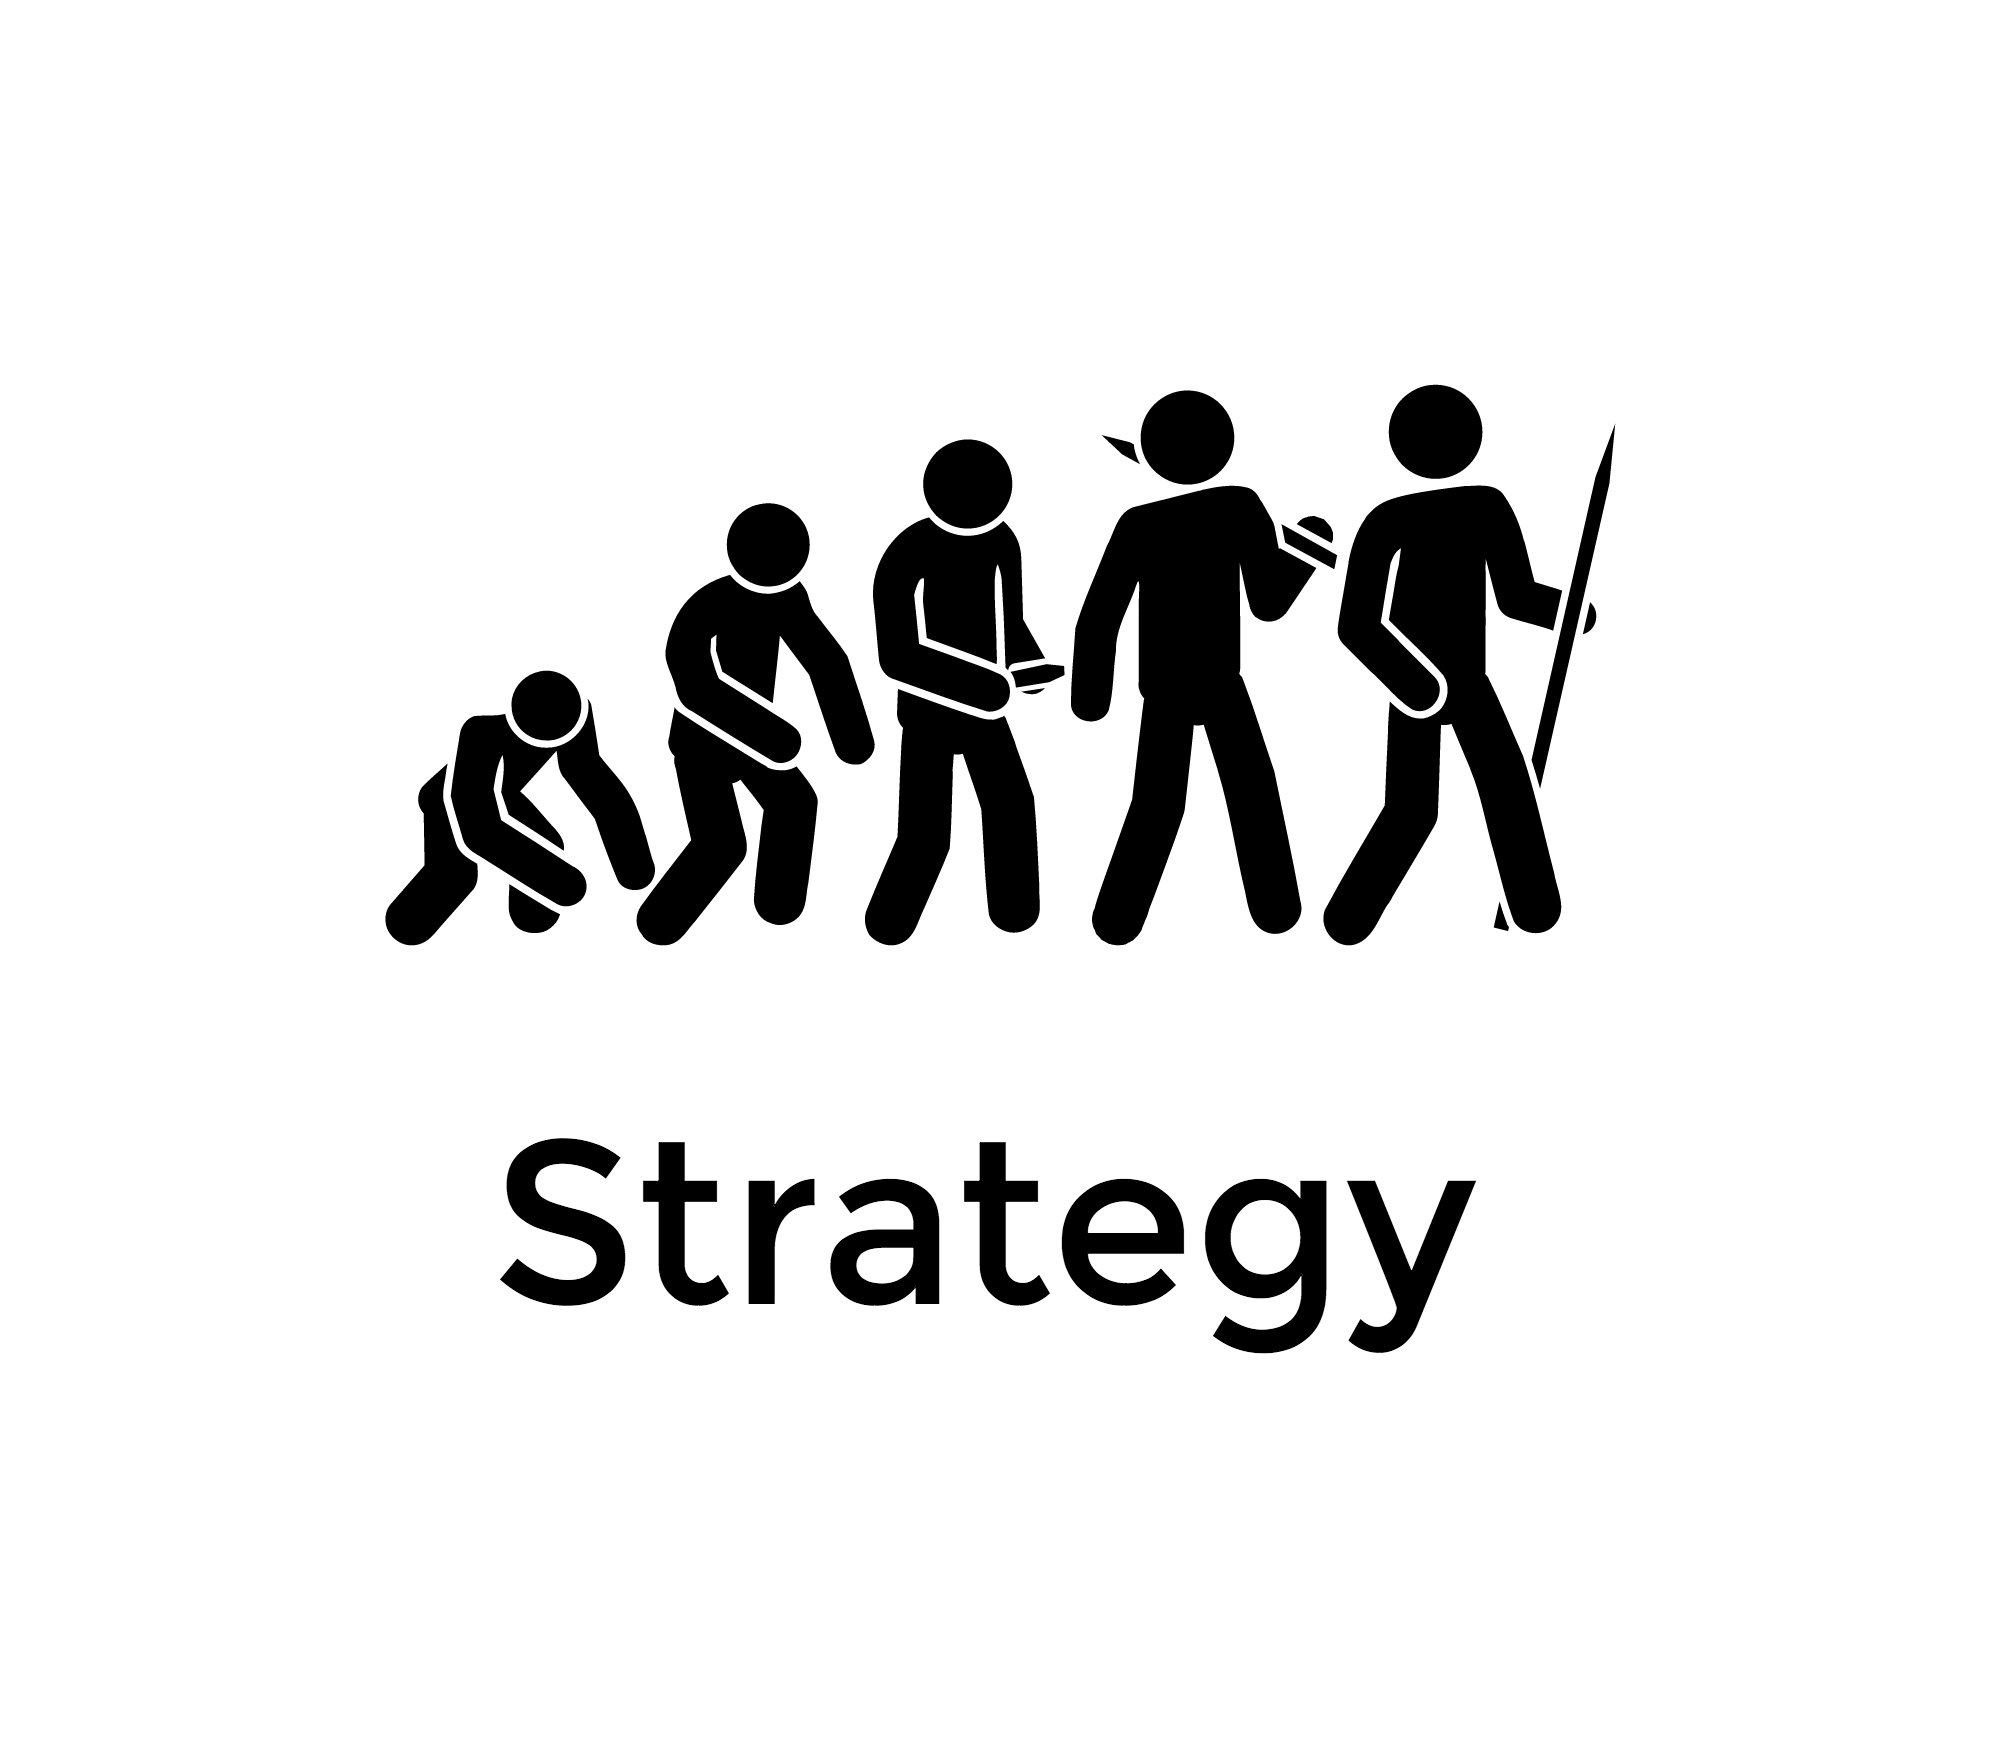 logo-black(4).png